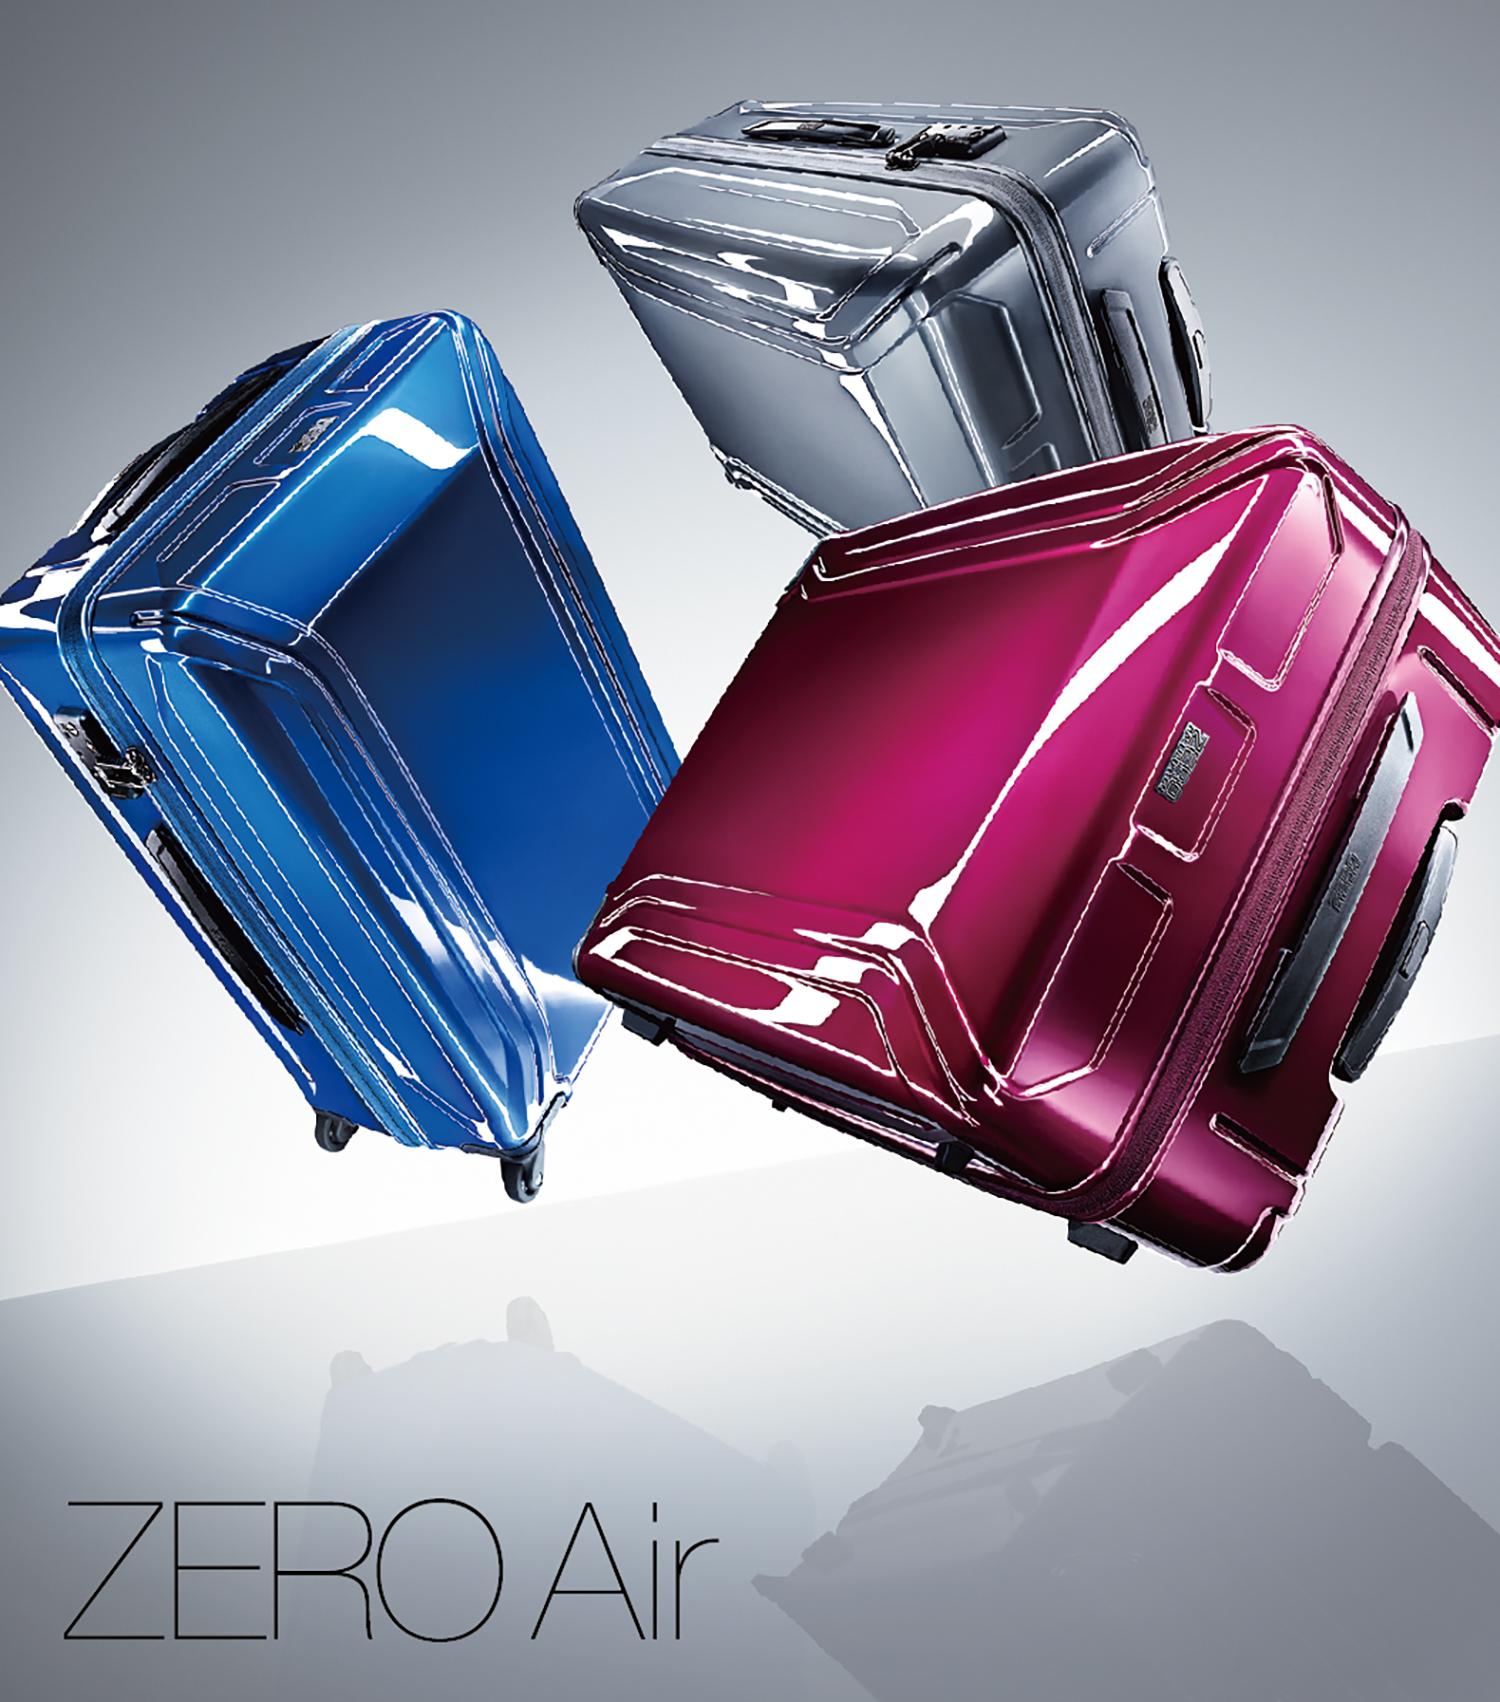 ZERO_Air_001